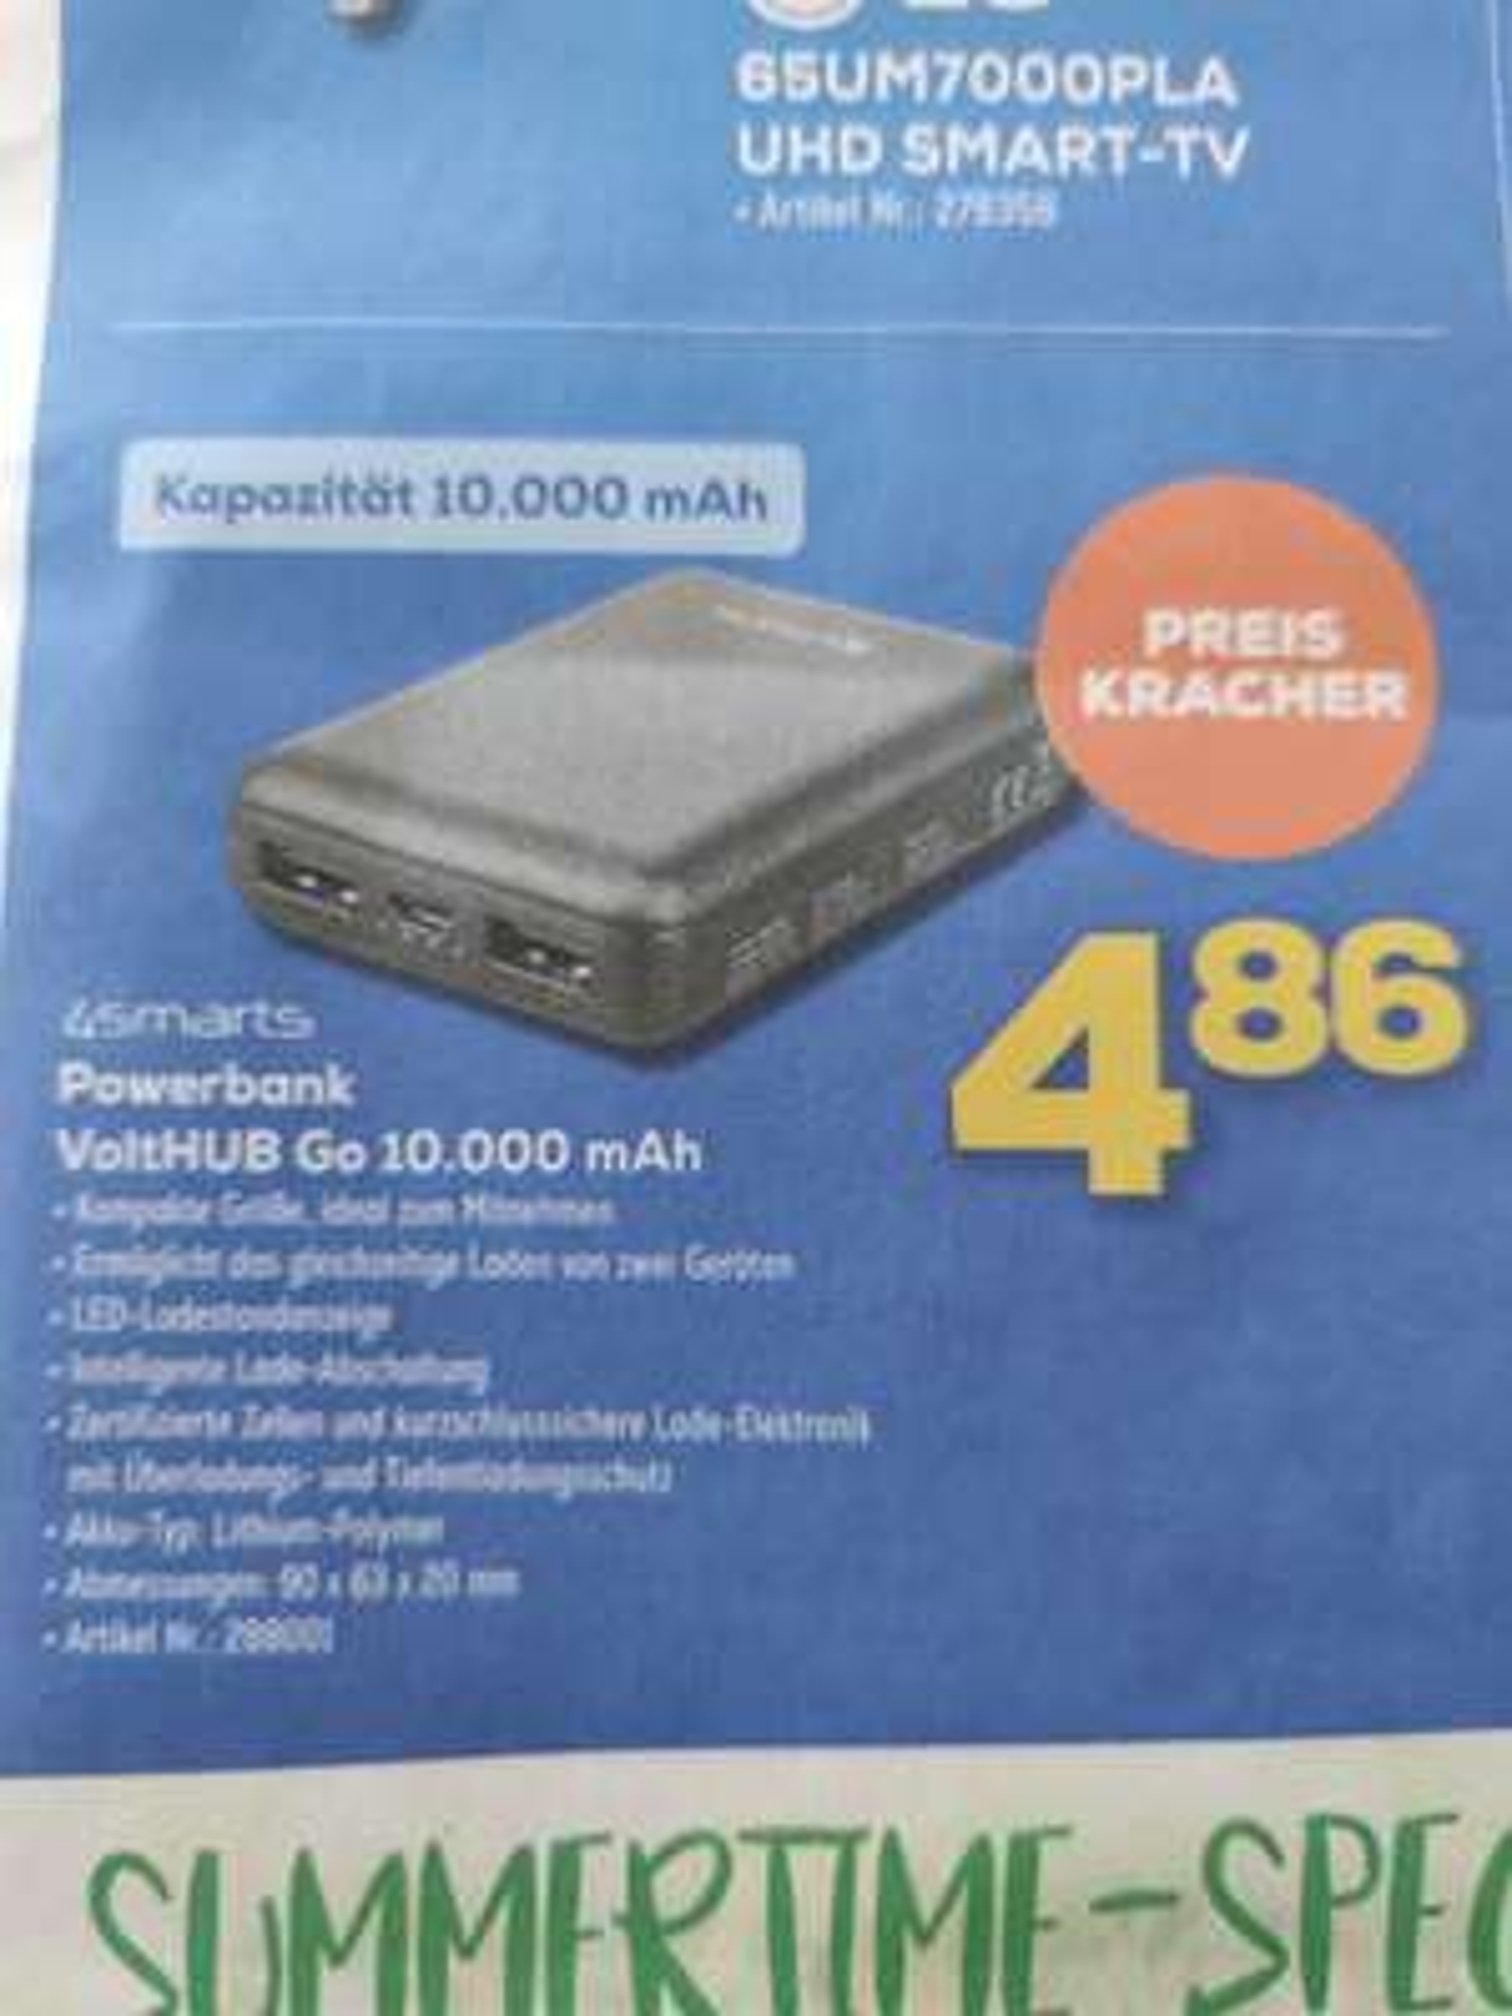 (Bundesweit Euronics oder Versand) 10.000 mAh Powerbank für 4,86€